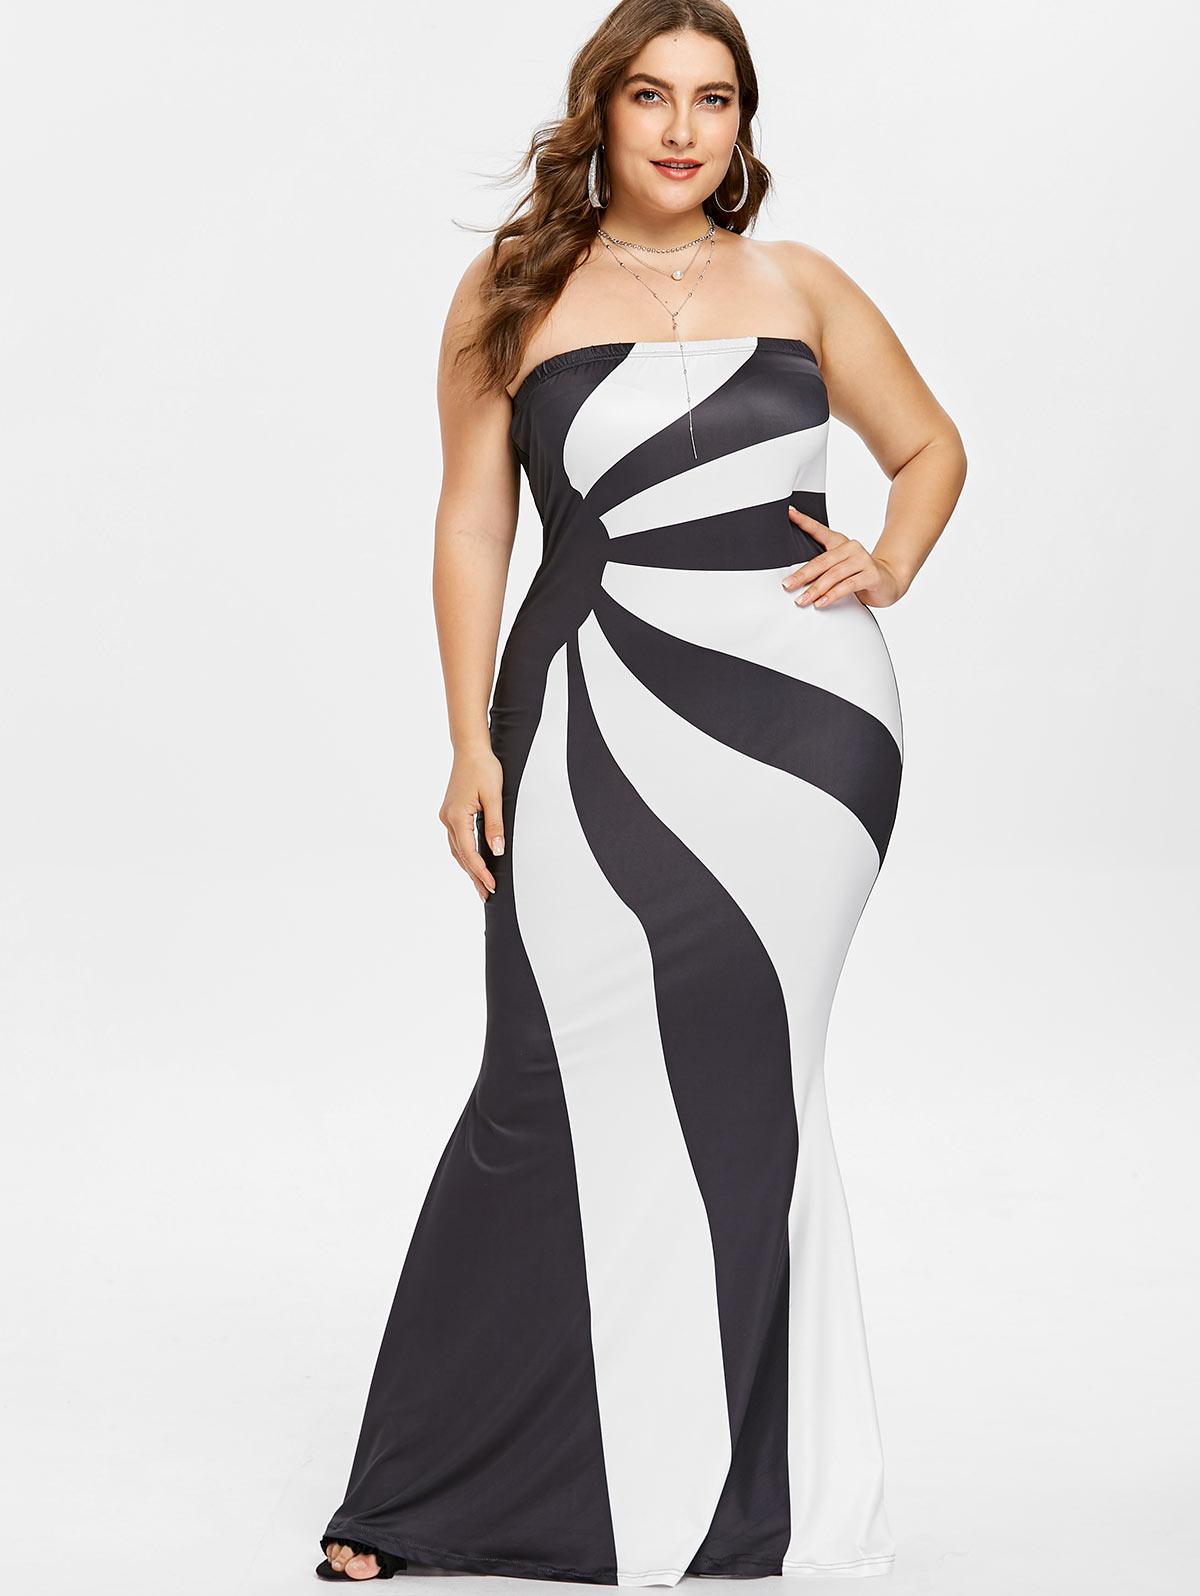 Wipalo Plus Size 5XL Women Color Block Floor Length Bandeau Dress ...